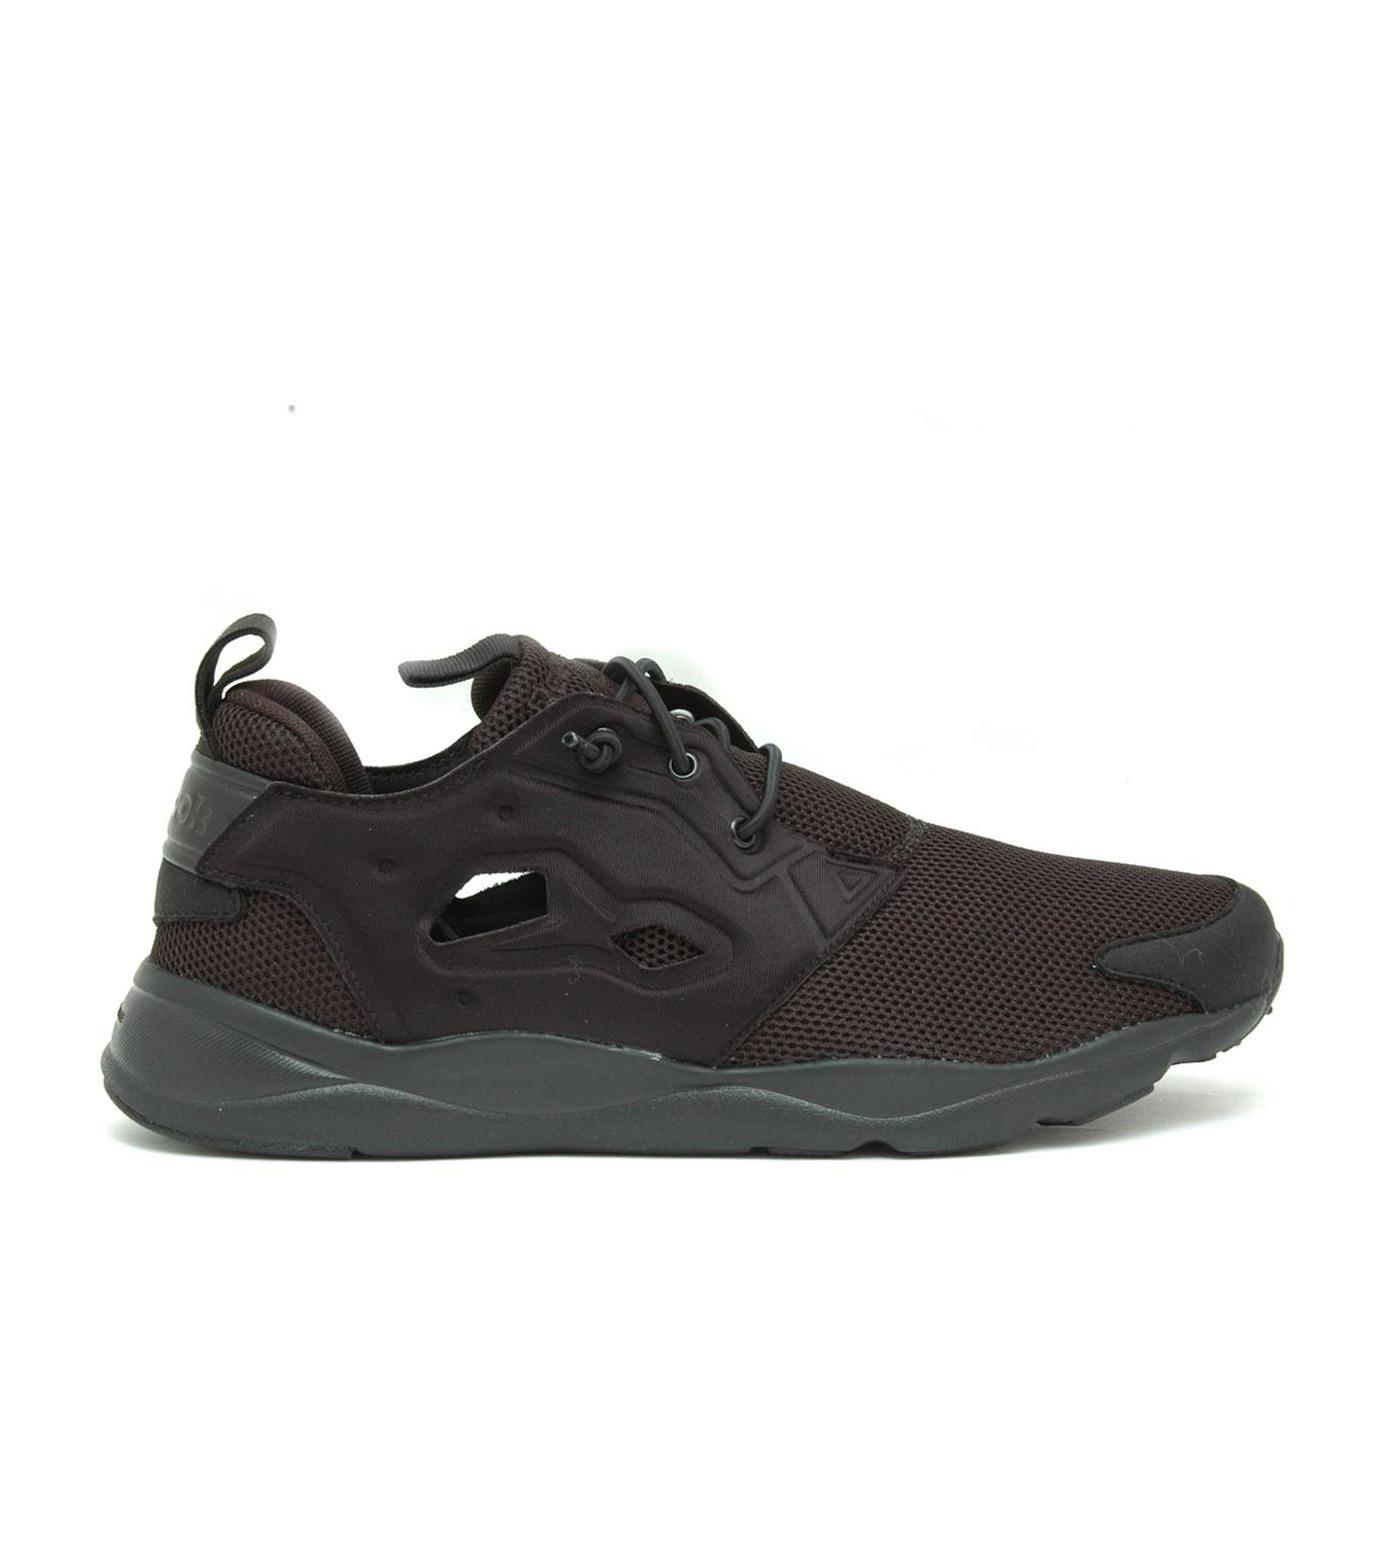 Reebok(リーボック)のFURYLITE-BLACK(シューズ/shoes)-V67159-13 拡大詳細画像1